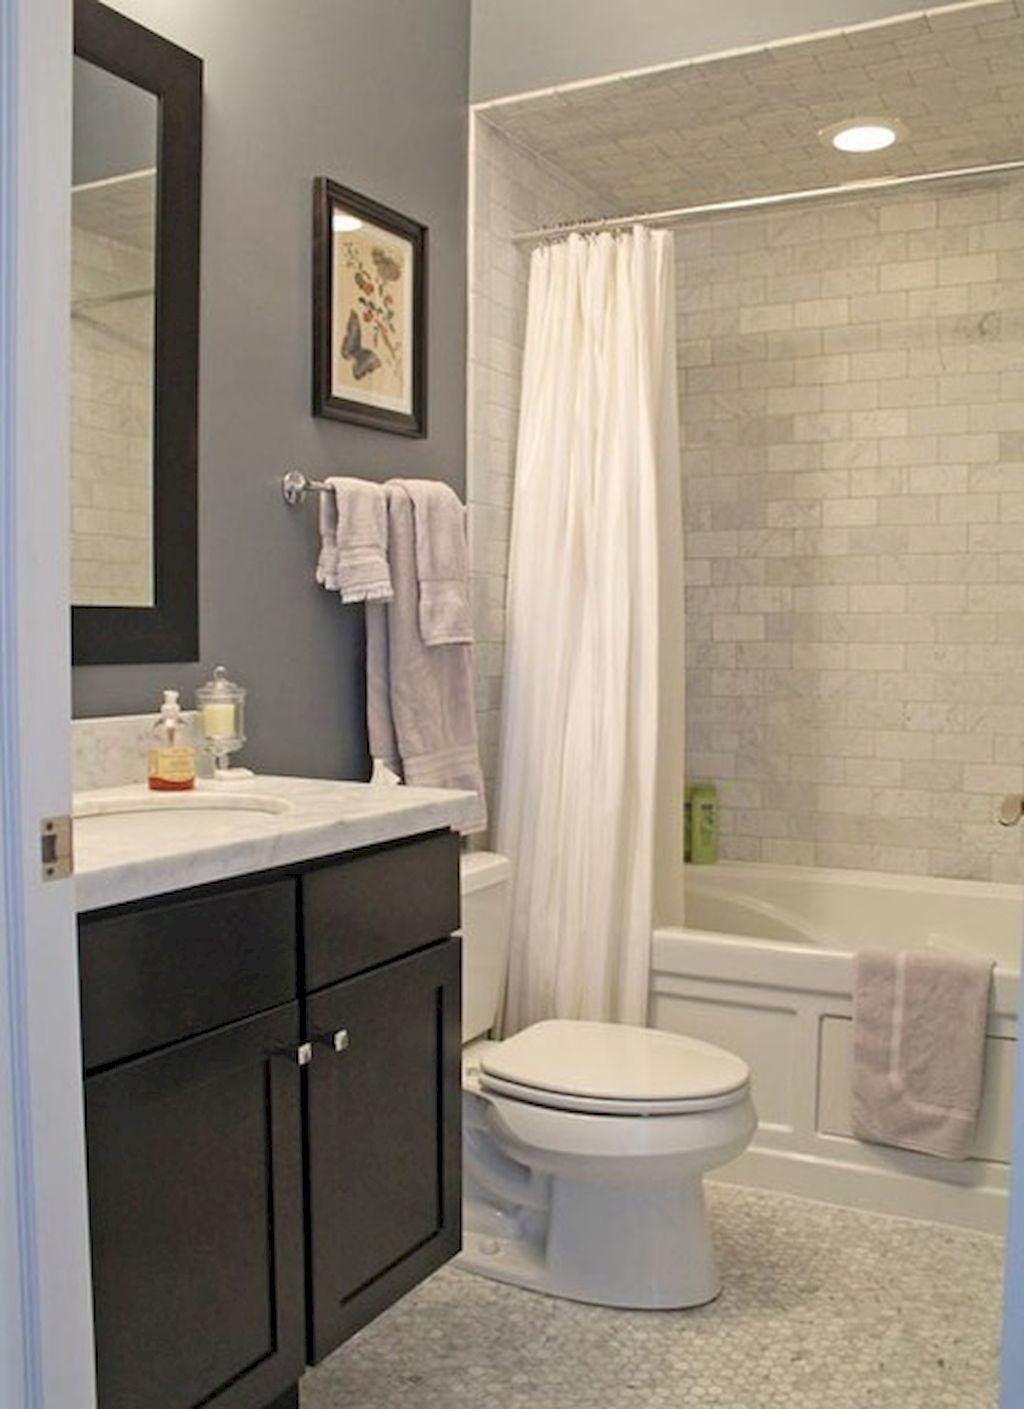 Apartment Bathroom Designs Adorable Inspiring Apartment Bathroom Remodel Ideas On A Budget 23 Design Inspiration